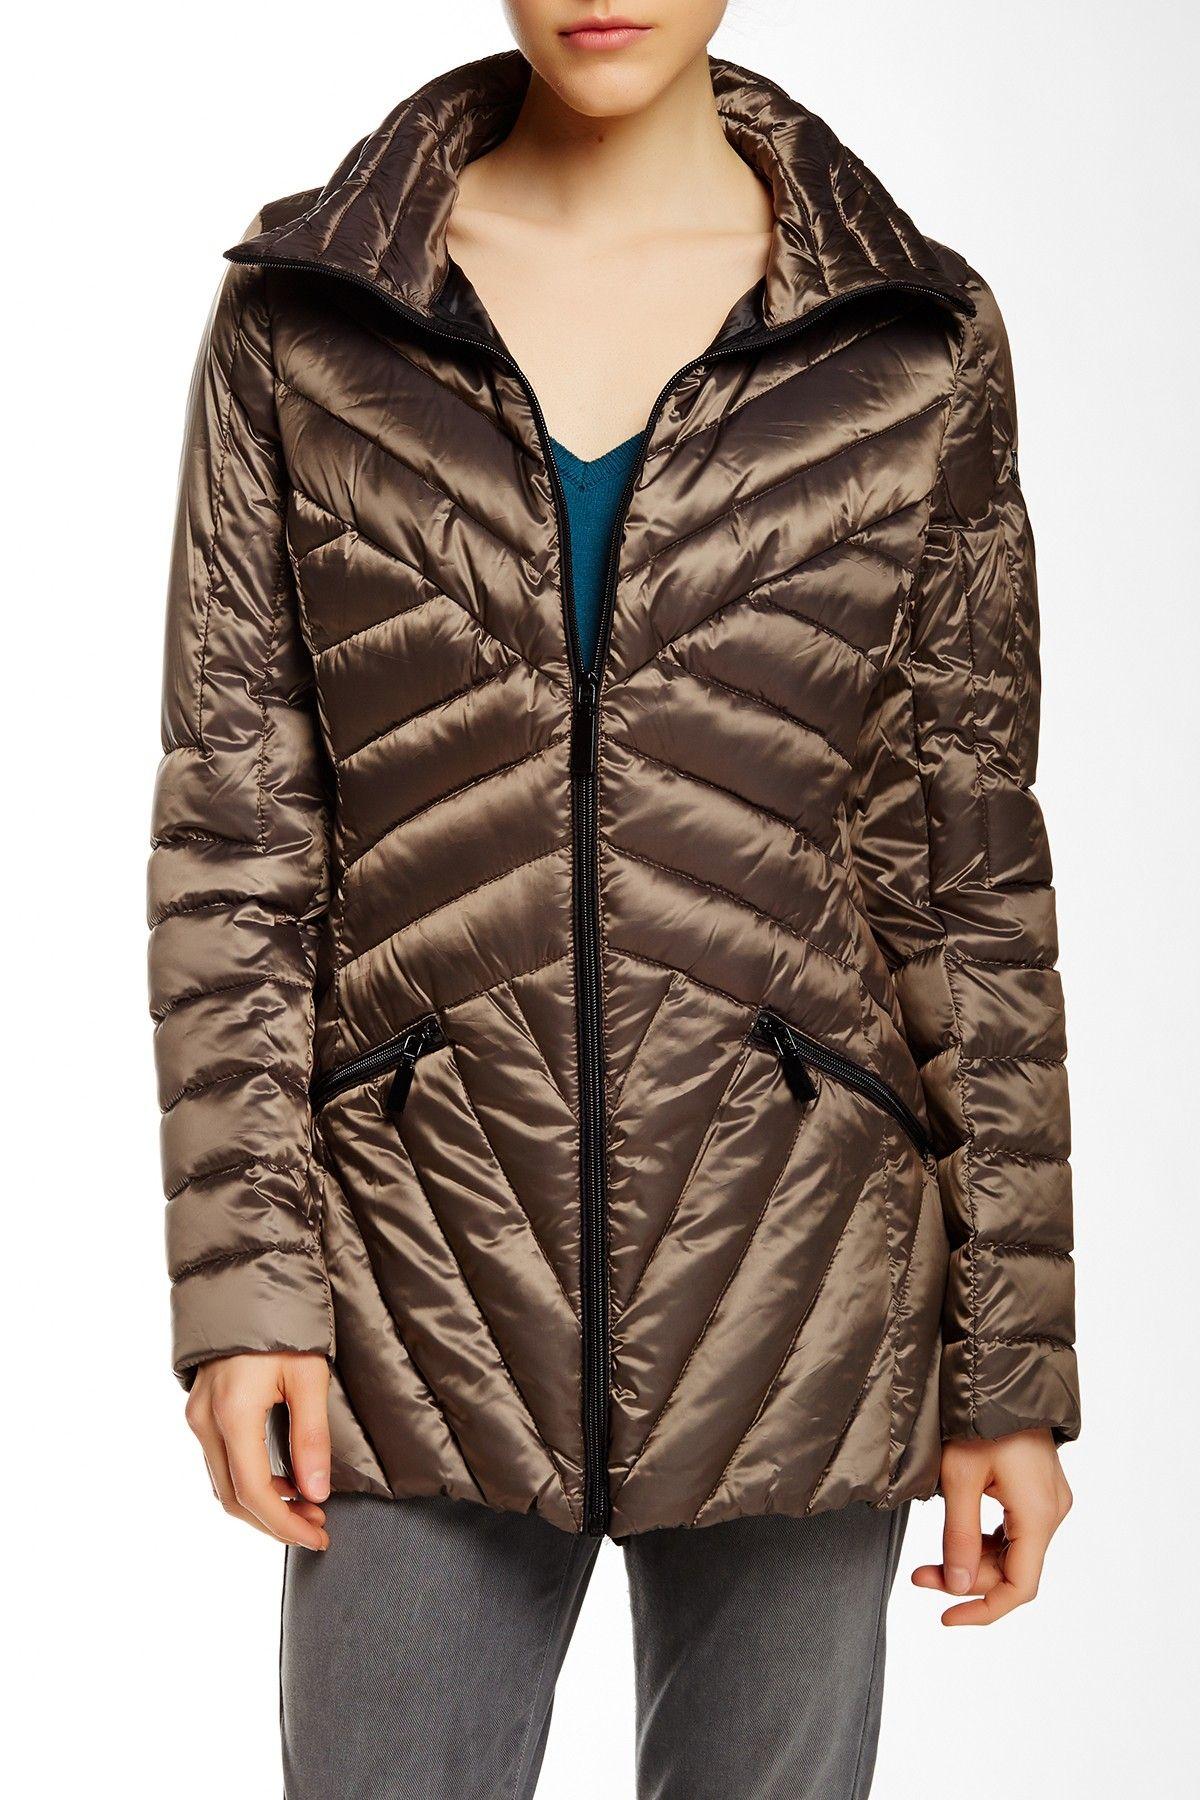 Mid Down Puffer Jacket Jackets Puffer Jackets Winter Jackets [ 1800 x 1200 Pixel ]